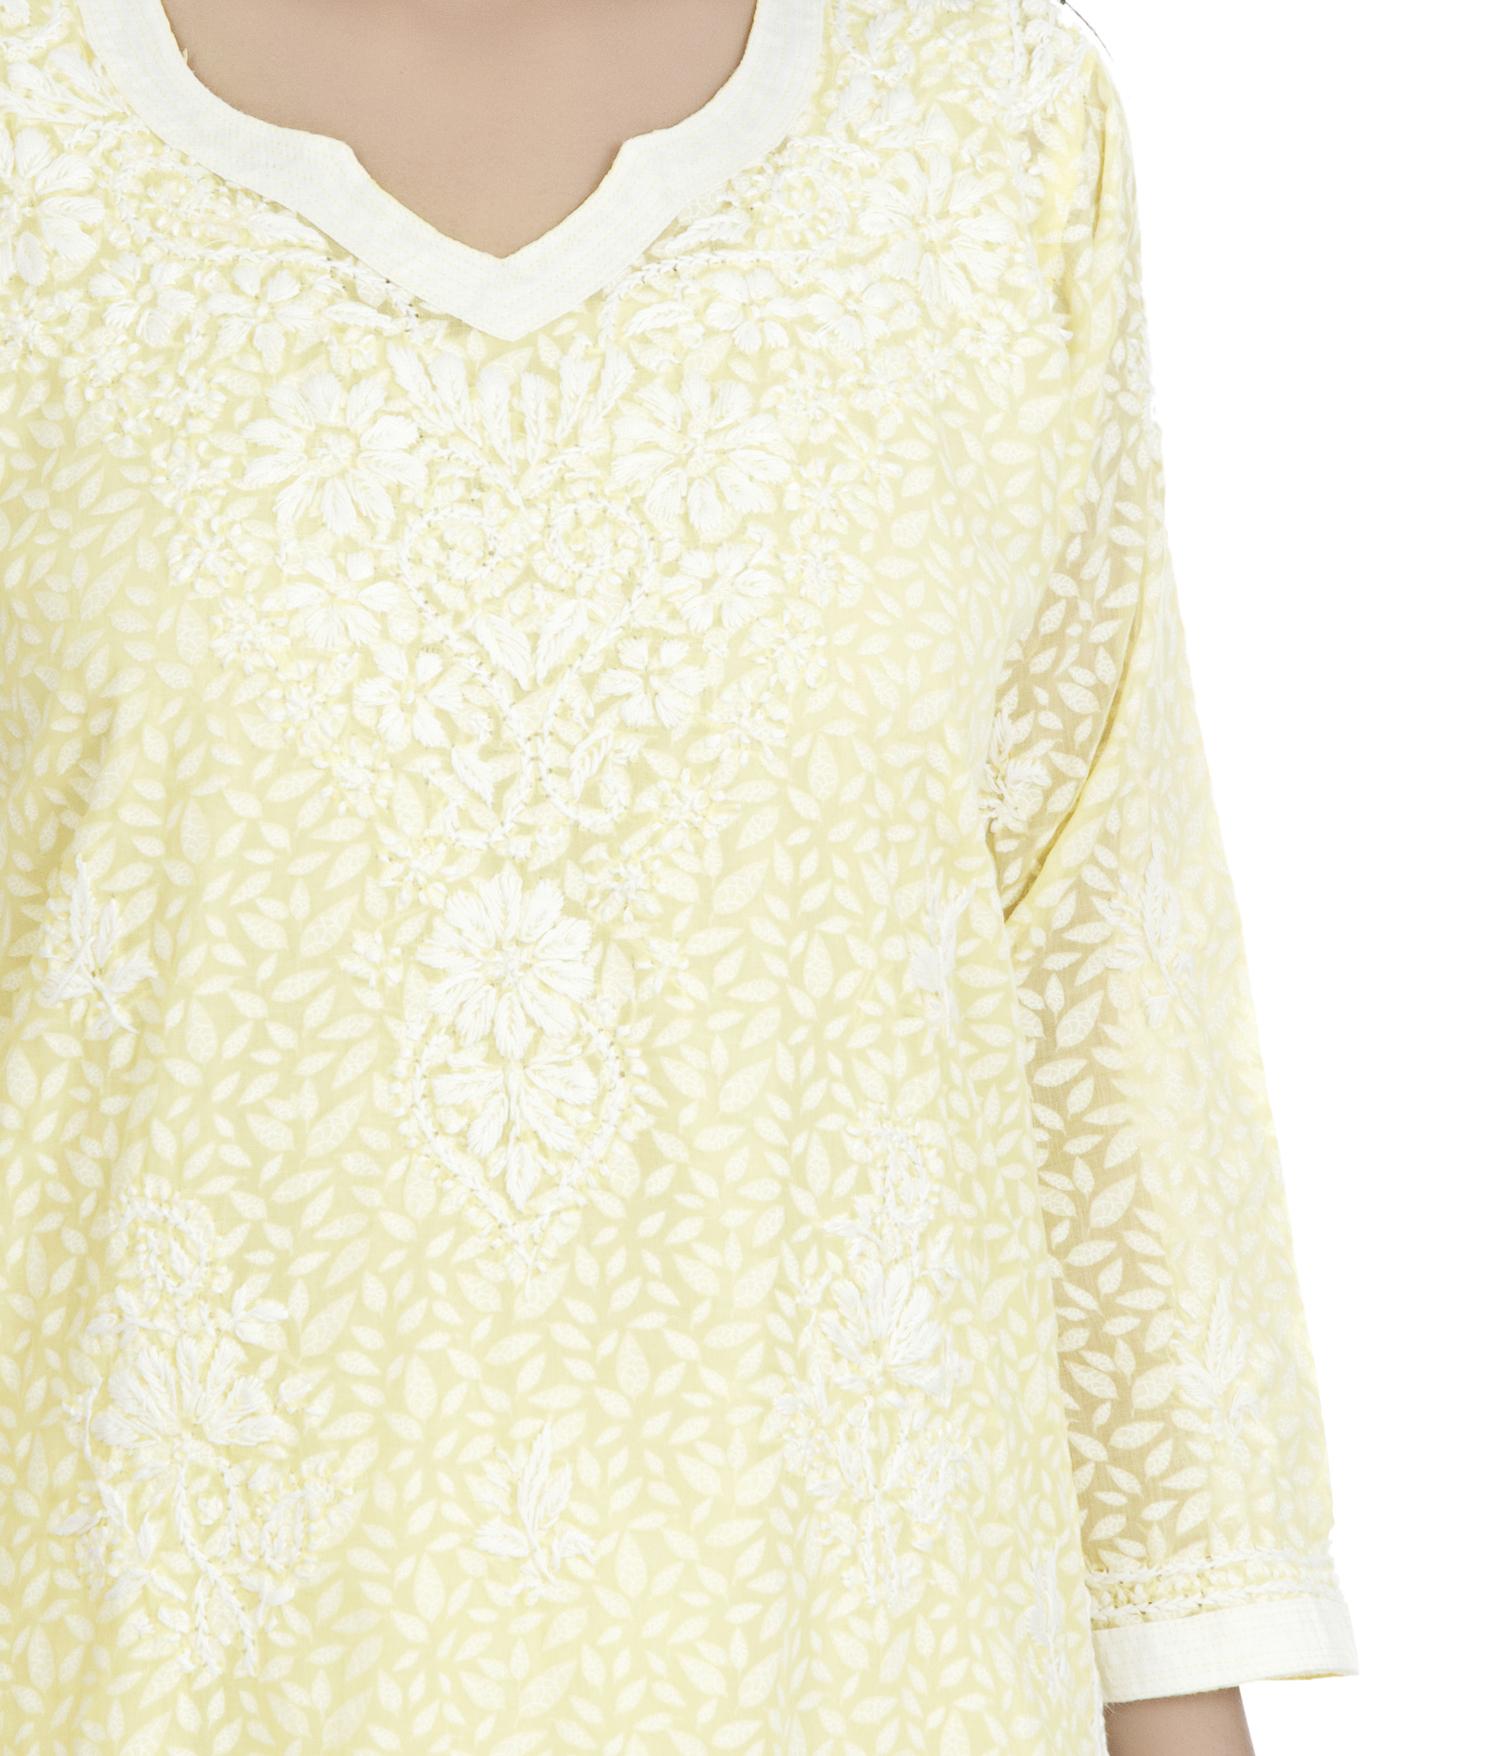 Ethnava Hand Embroidered Cotton Lucknowi Chikankari Straight Kurti